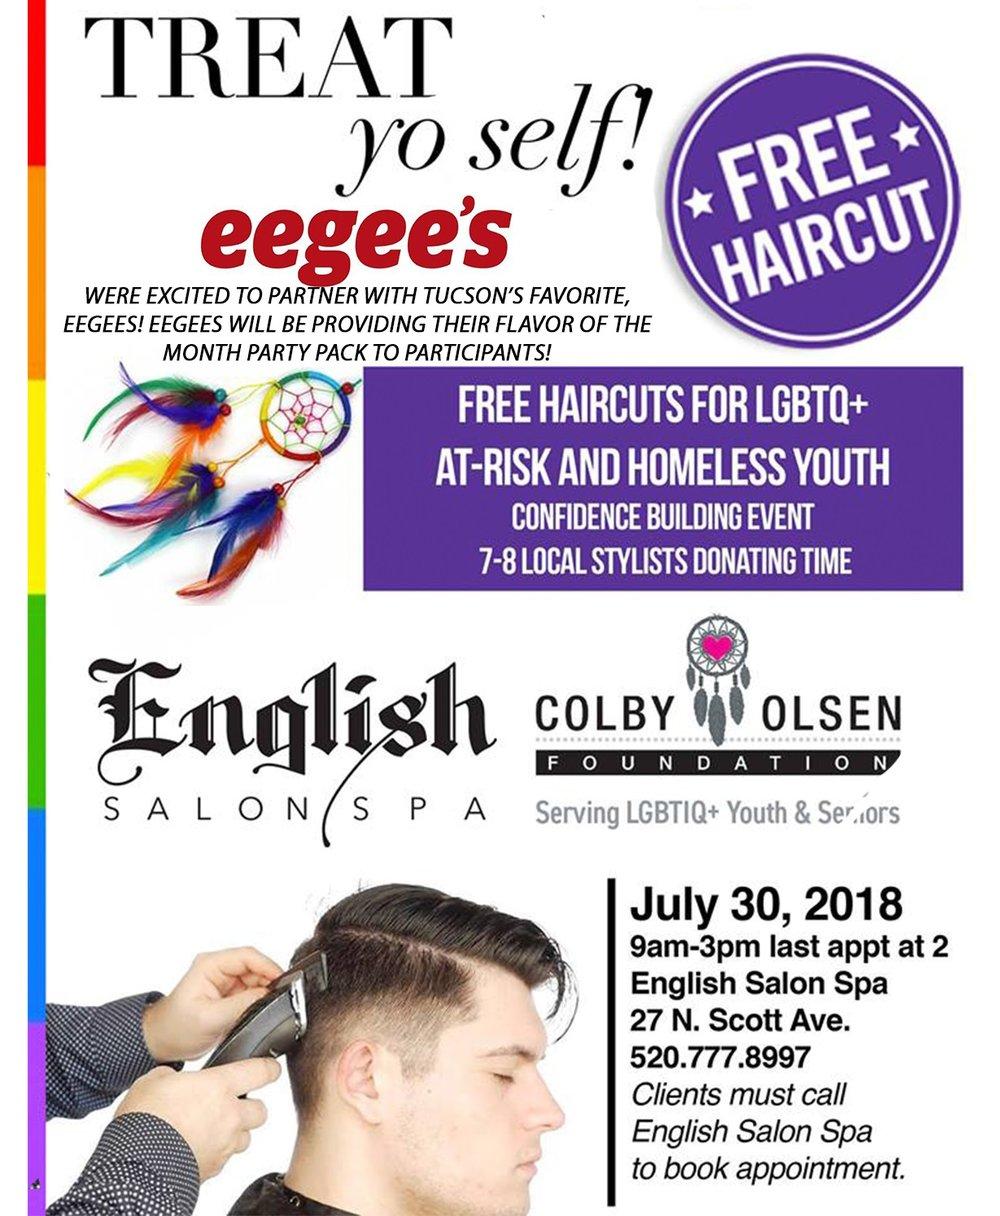 Treat Yo Self Colby Olsen Foundation